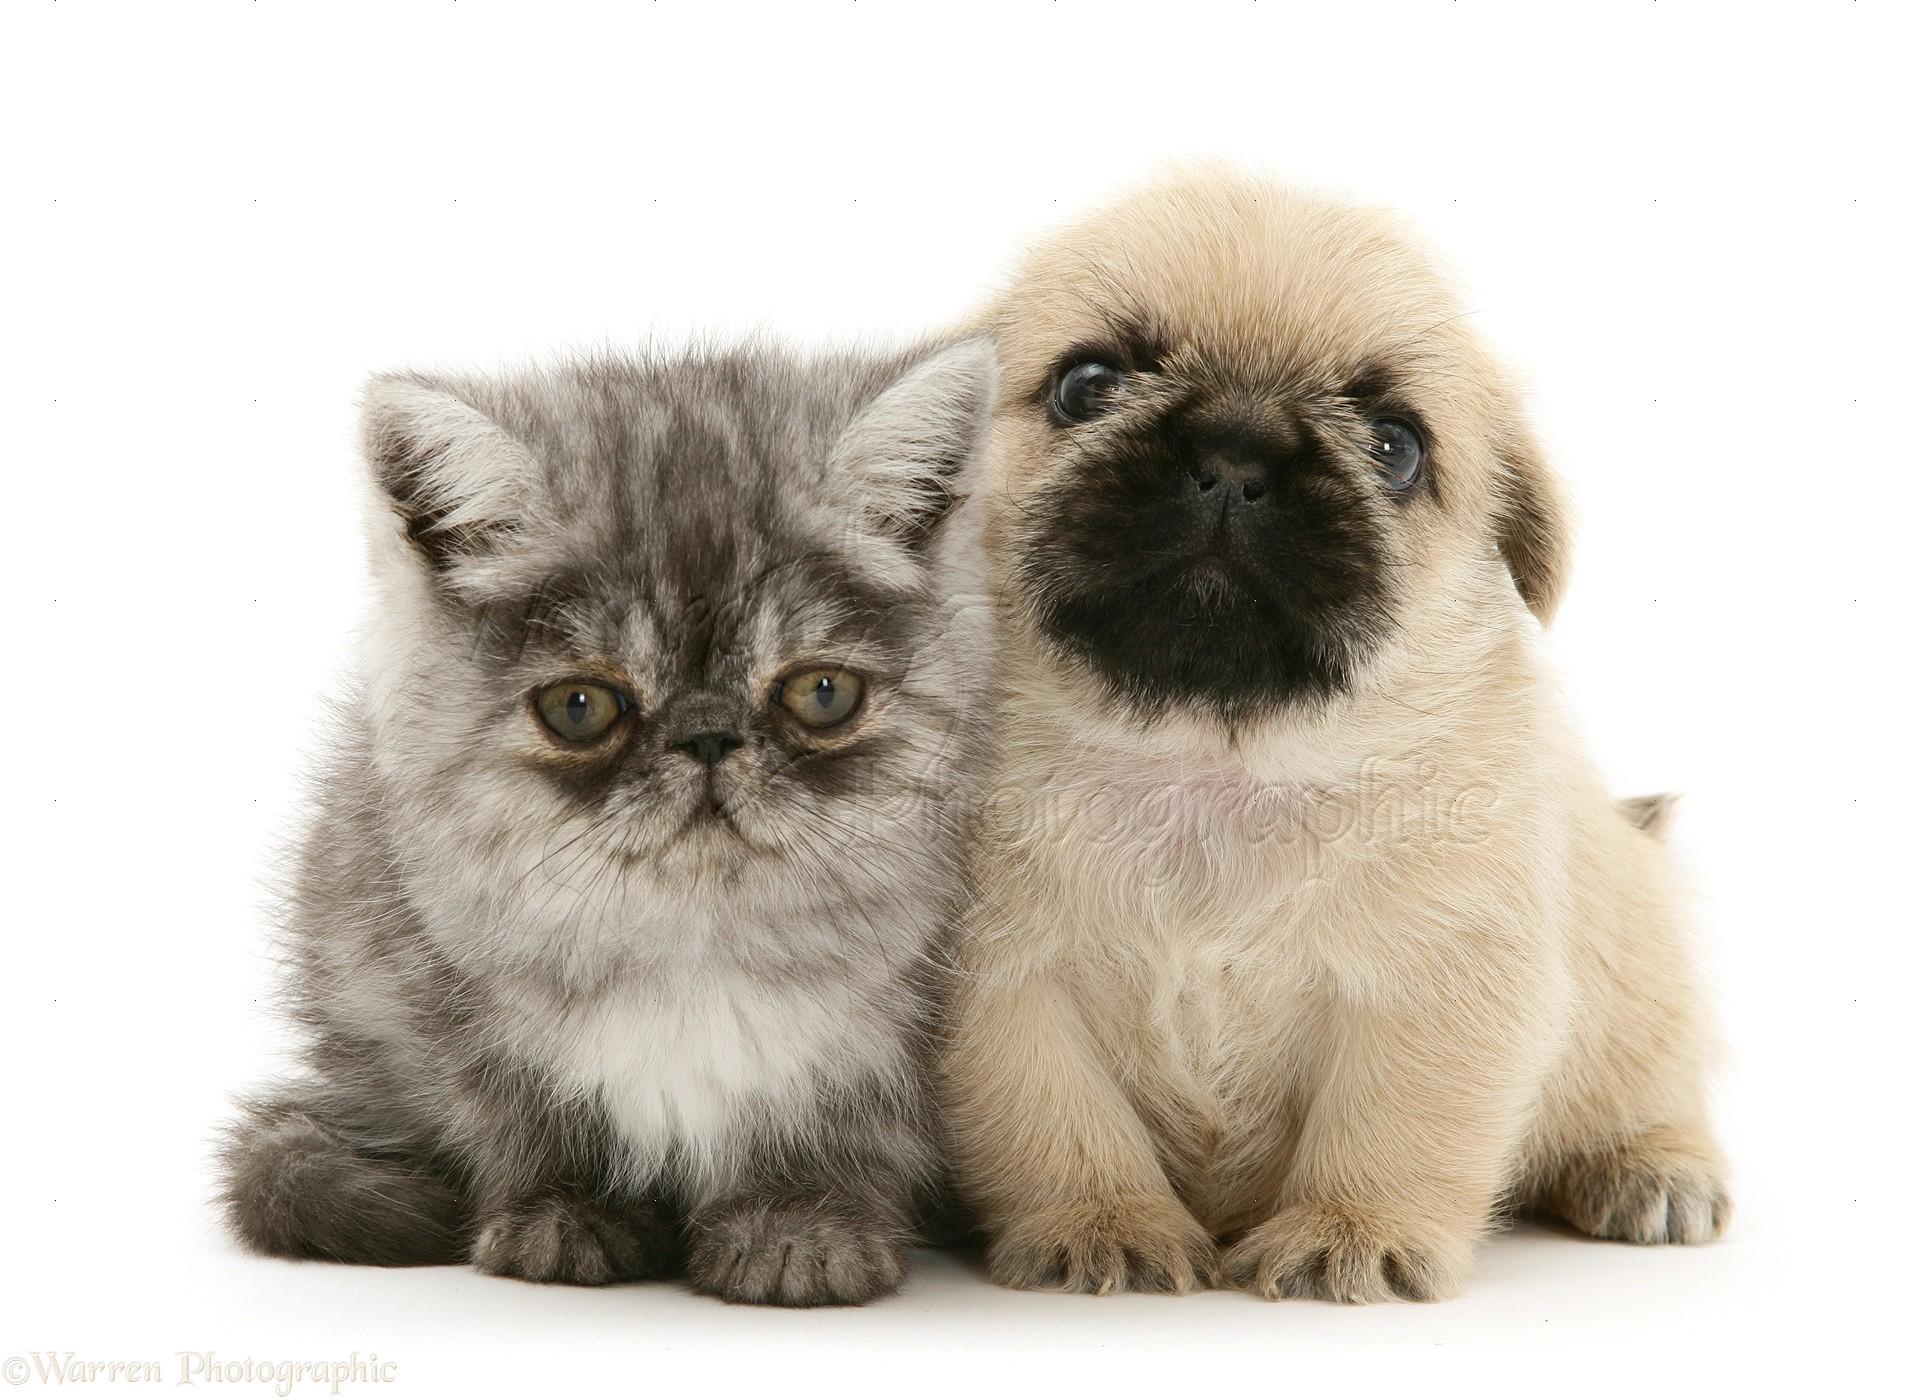 онлайн-блокнот мопсы и кошки картинки утонченный вкус